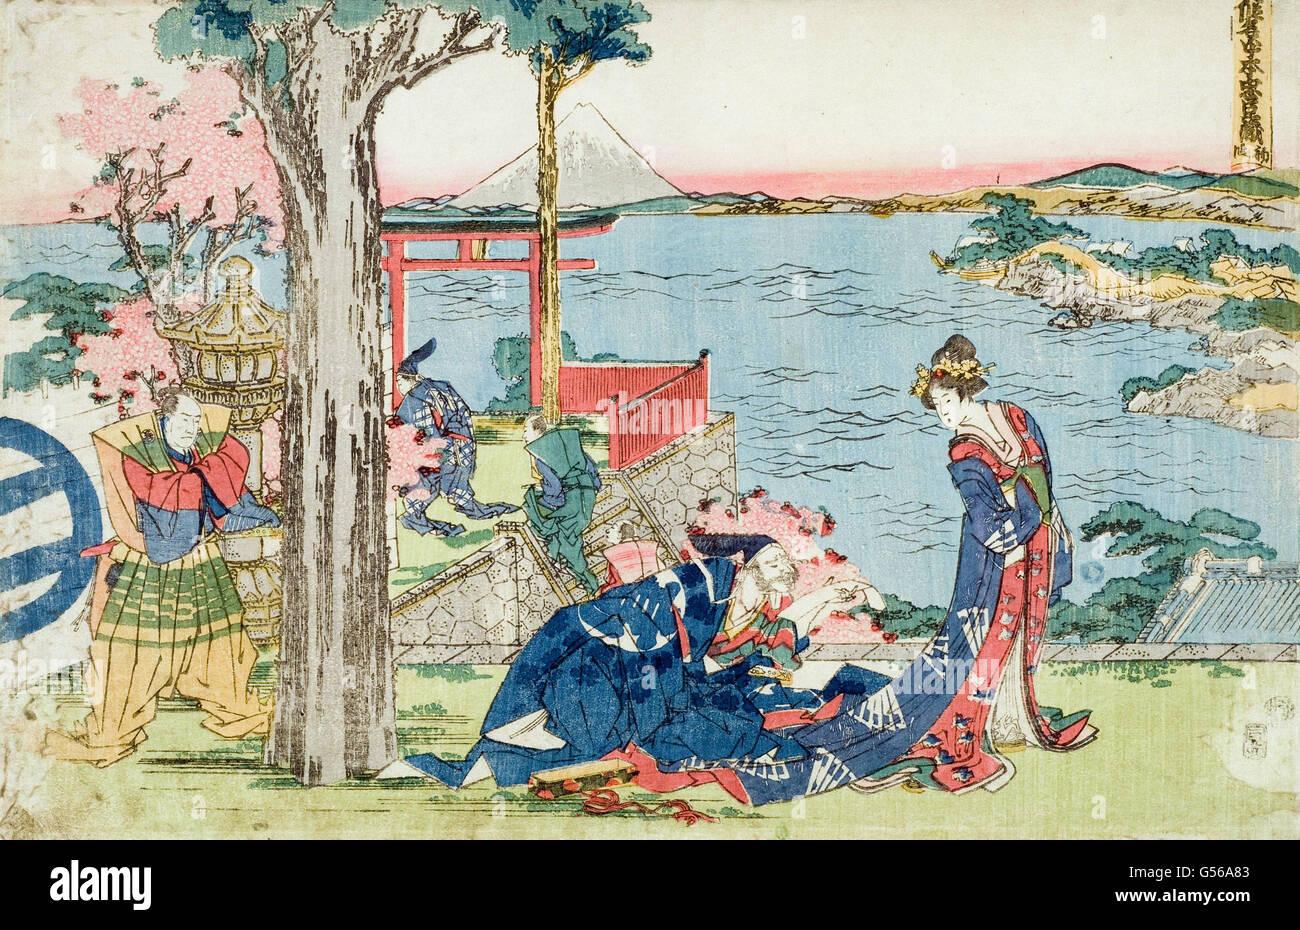 Katsushika Hokusai - Woodcut - Stock Image